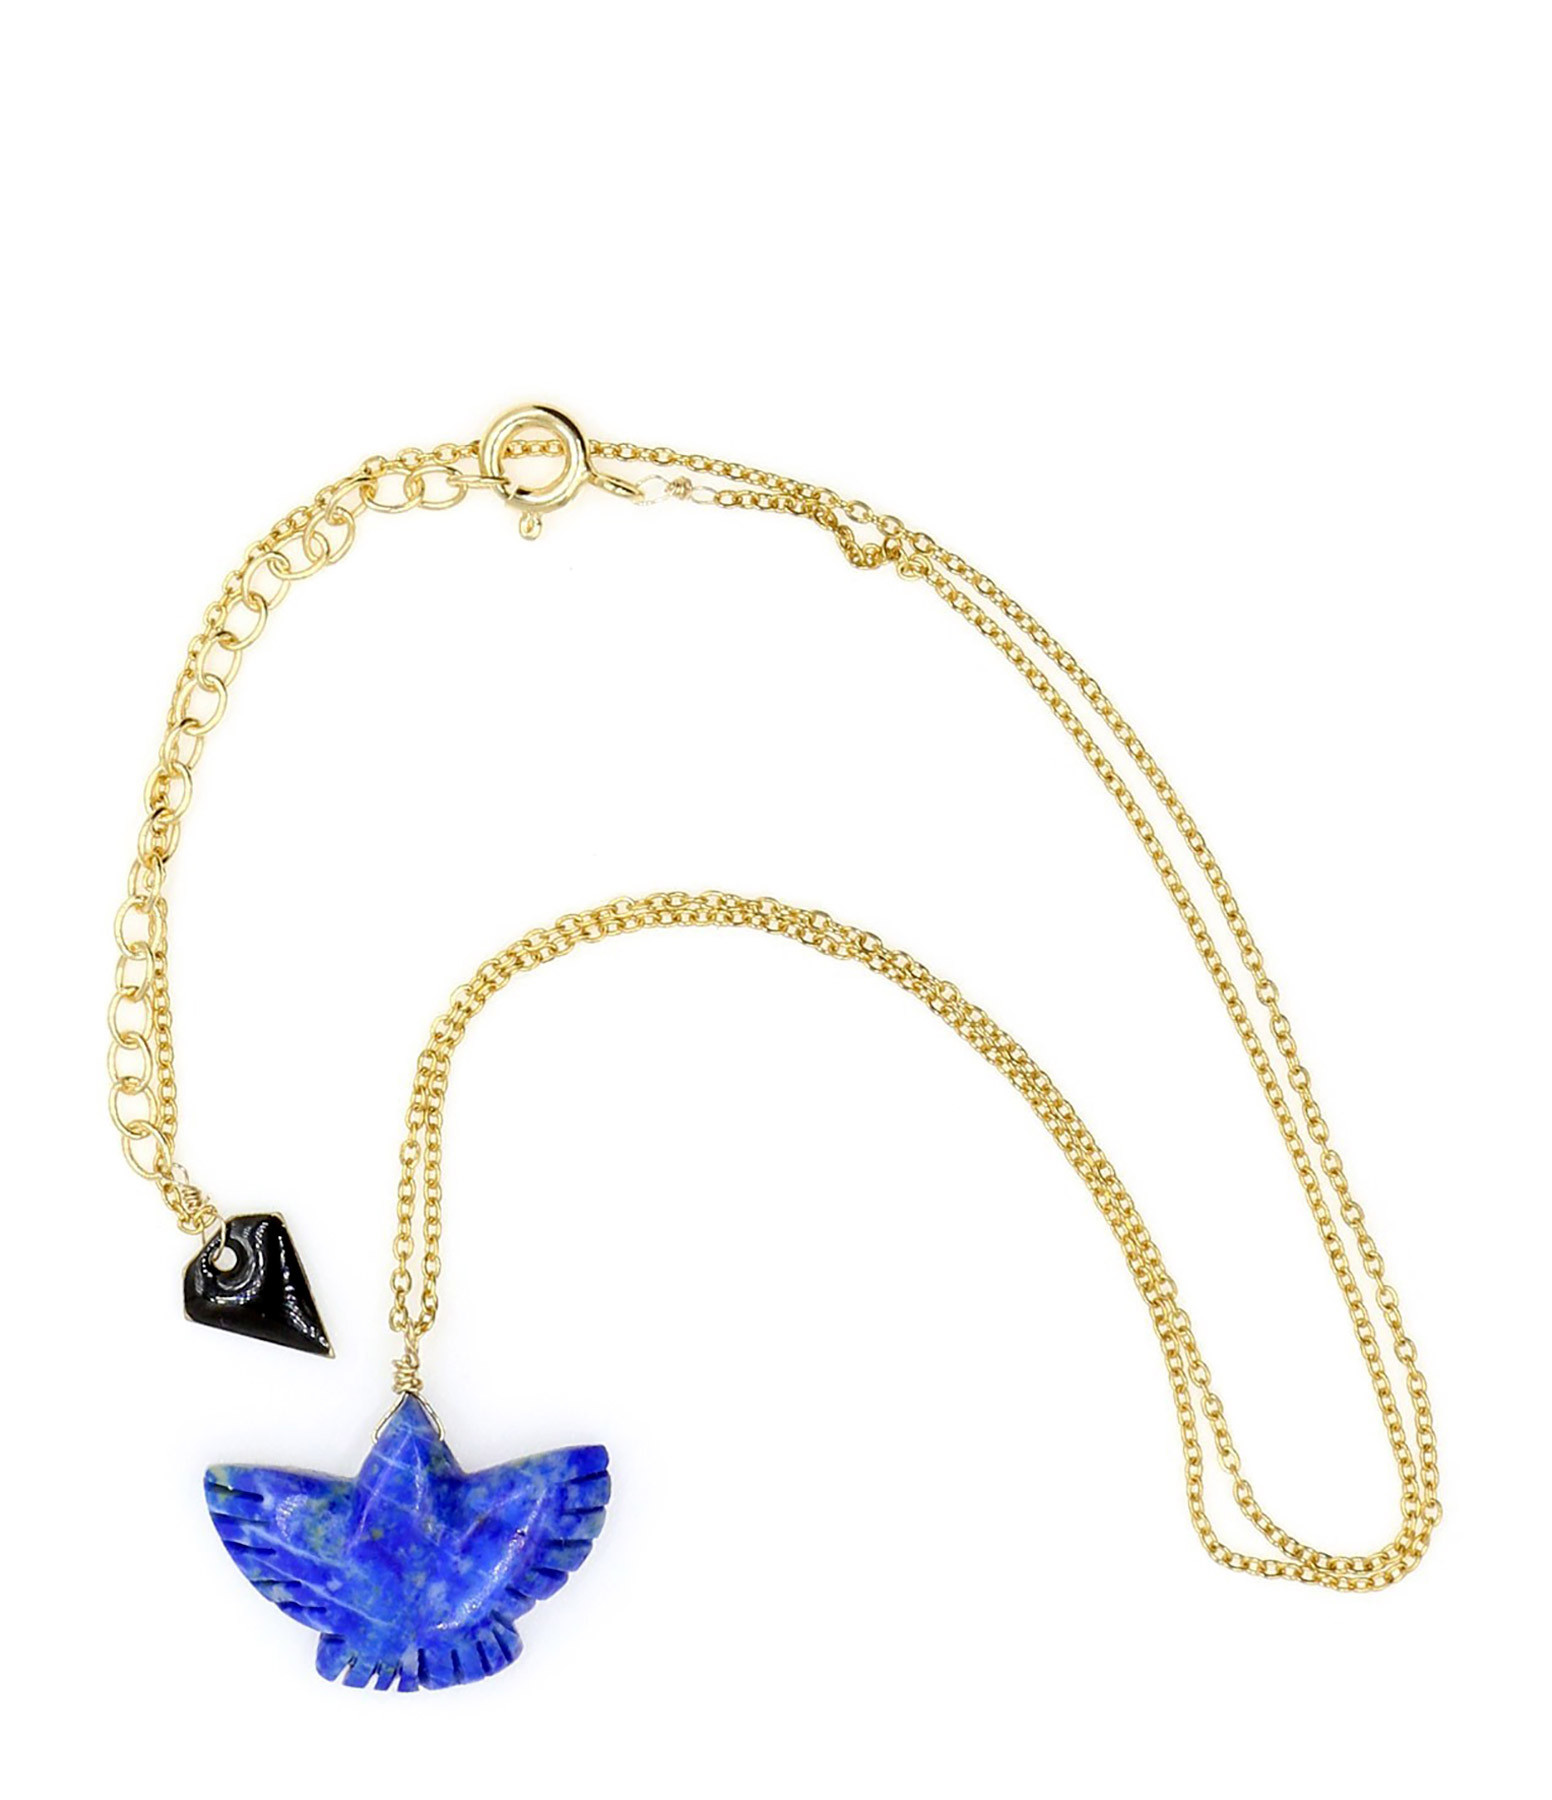 MON PRECIEUX GEM - Collier Condor Lapis Lazuli